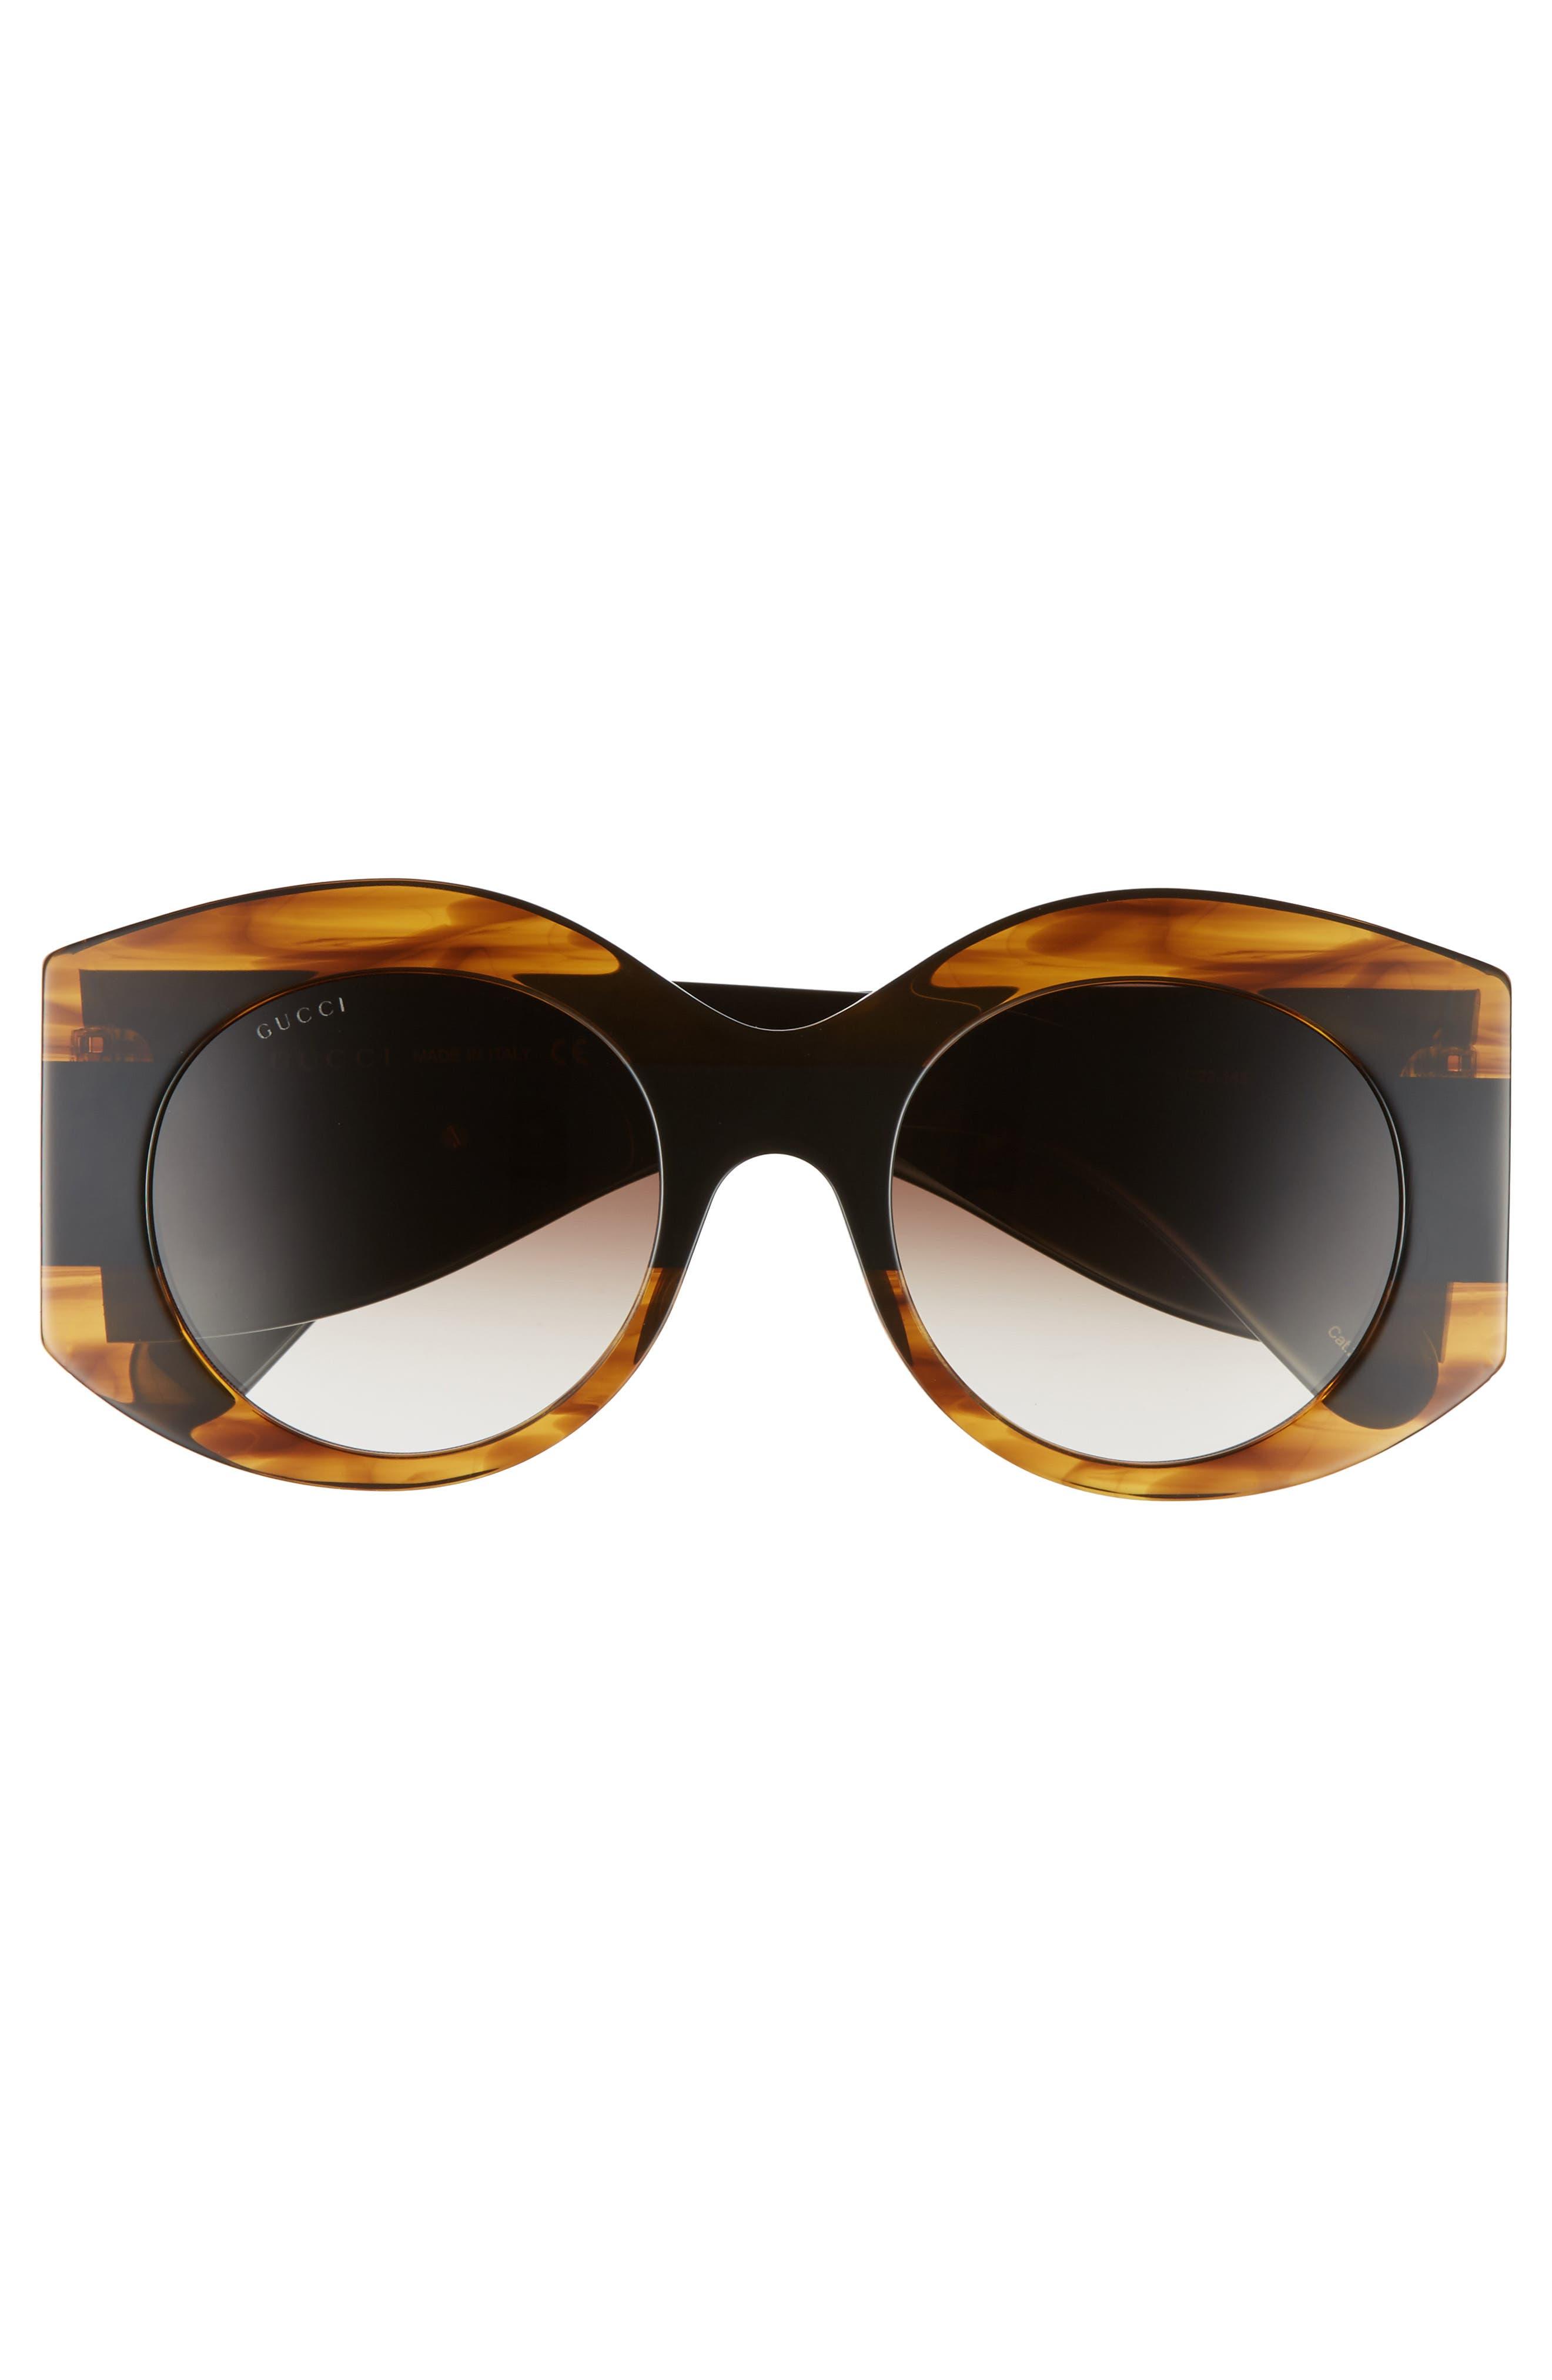 51mm Transparent Stripe Sunglasses,                             Alternate thumbnail 3, color,                             Havana